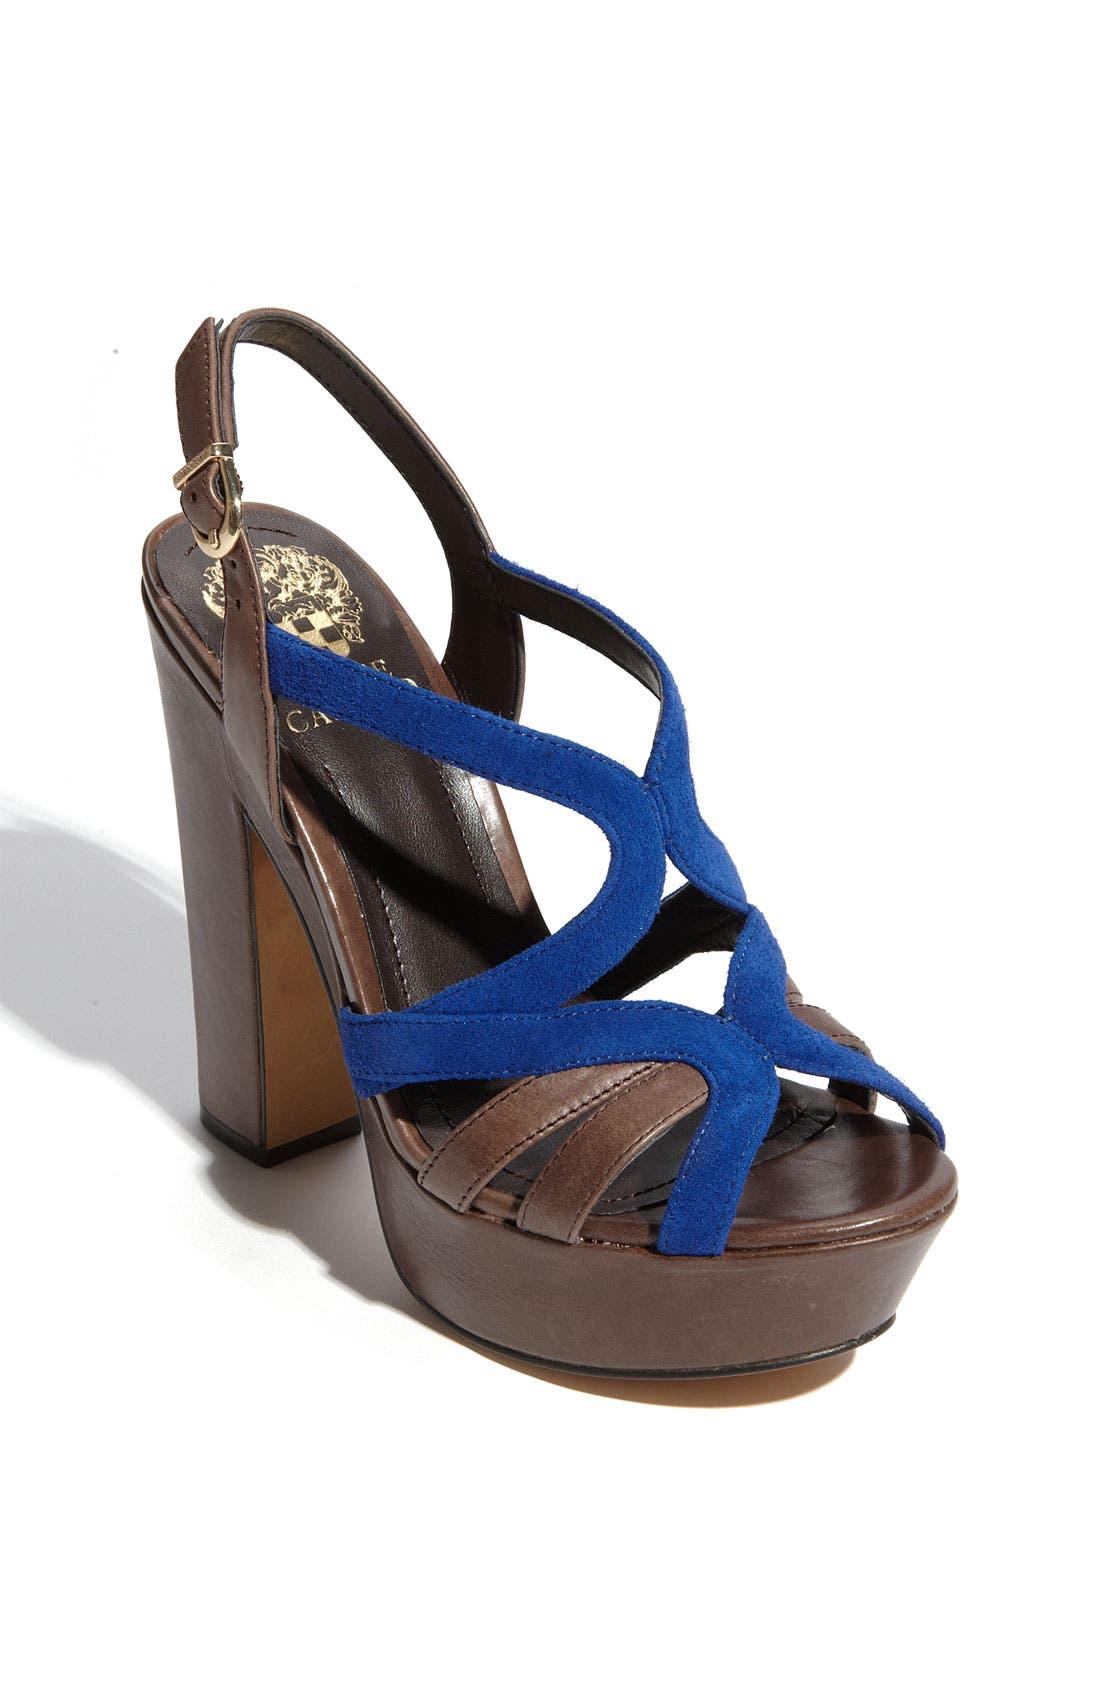 Main Image - Vince Camuto 'Deco' Sandal